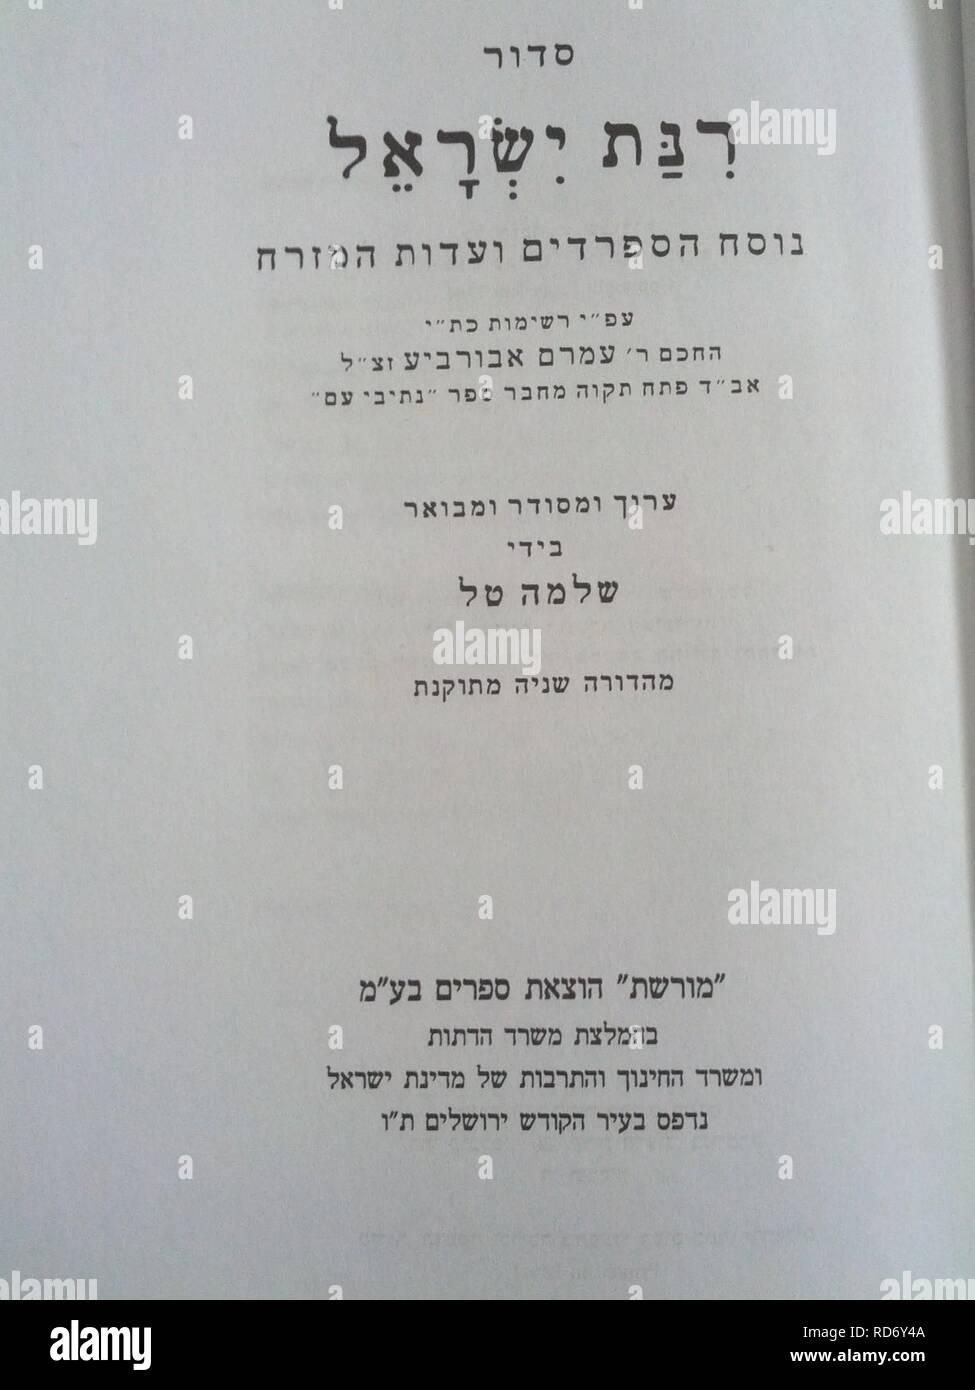 Amram Aburbeh Rinat Israel siddur Ha'Sfaradim ve'Edot HaMizrach. - Stock Image